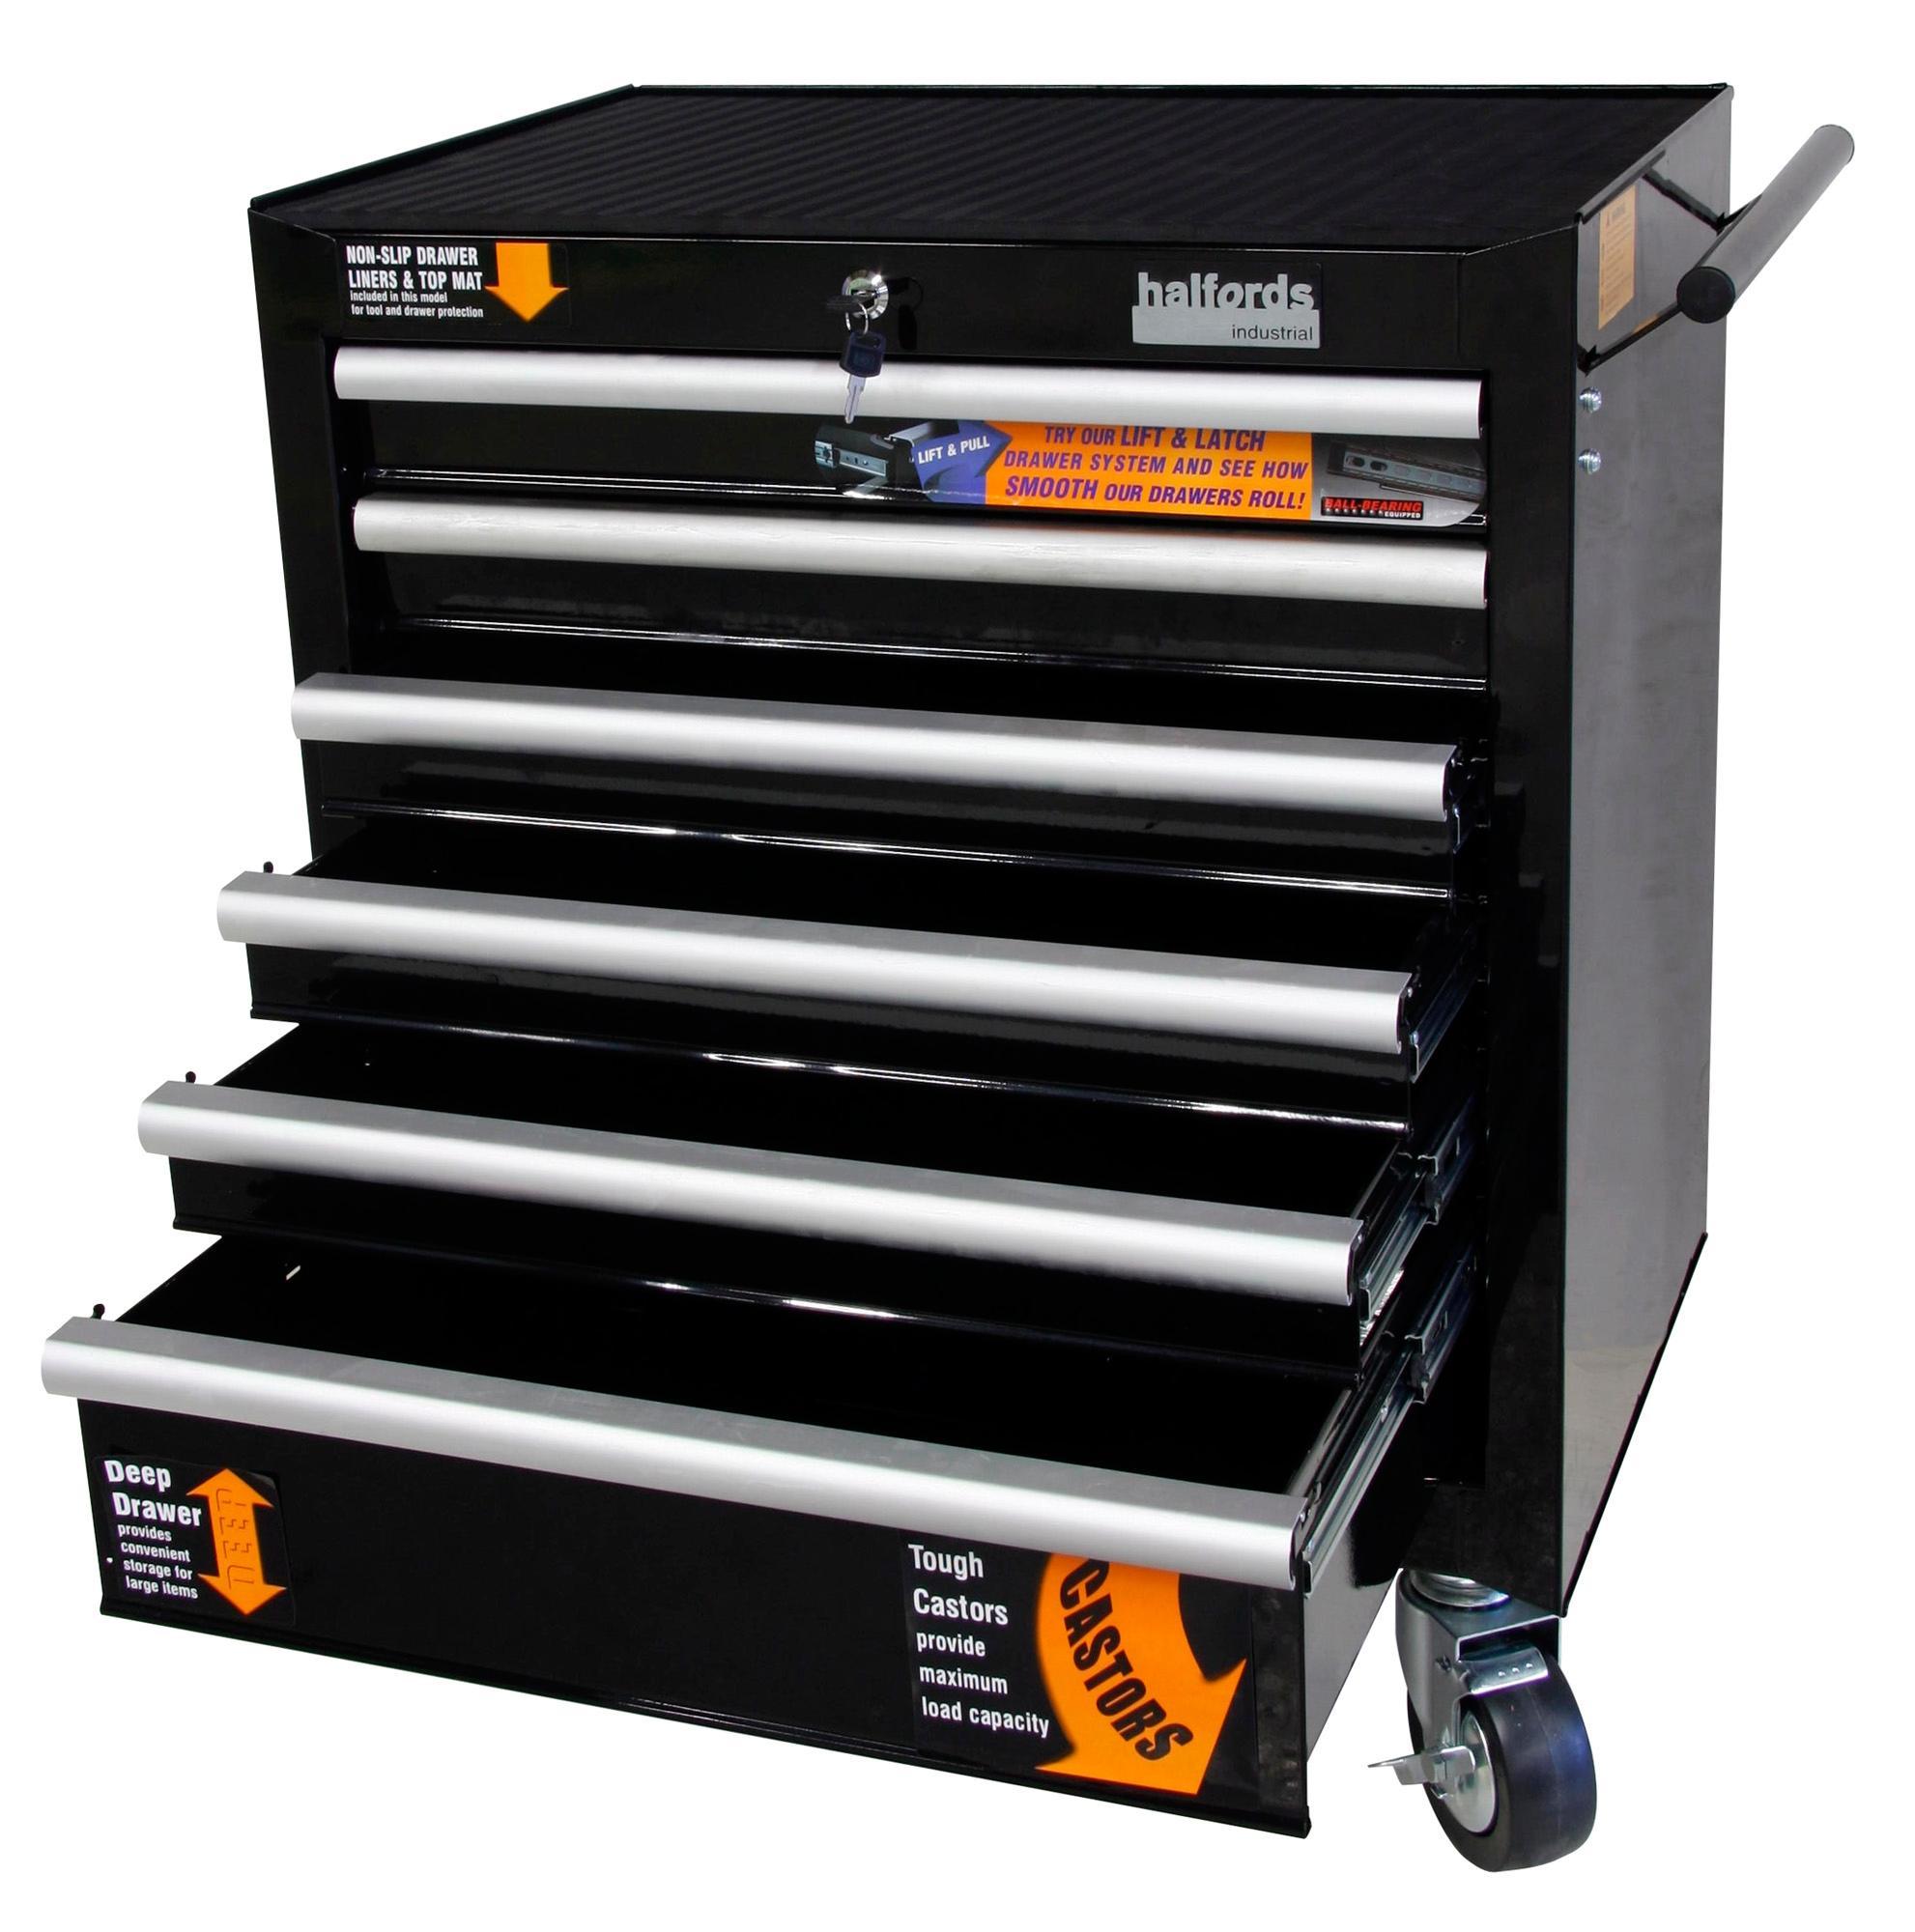 halfords industrial 6 drawer ball bearing tool cabinet. Black Bedroom Furniture Sets. Home Design Ideas